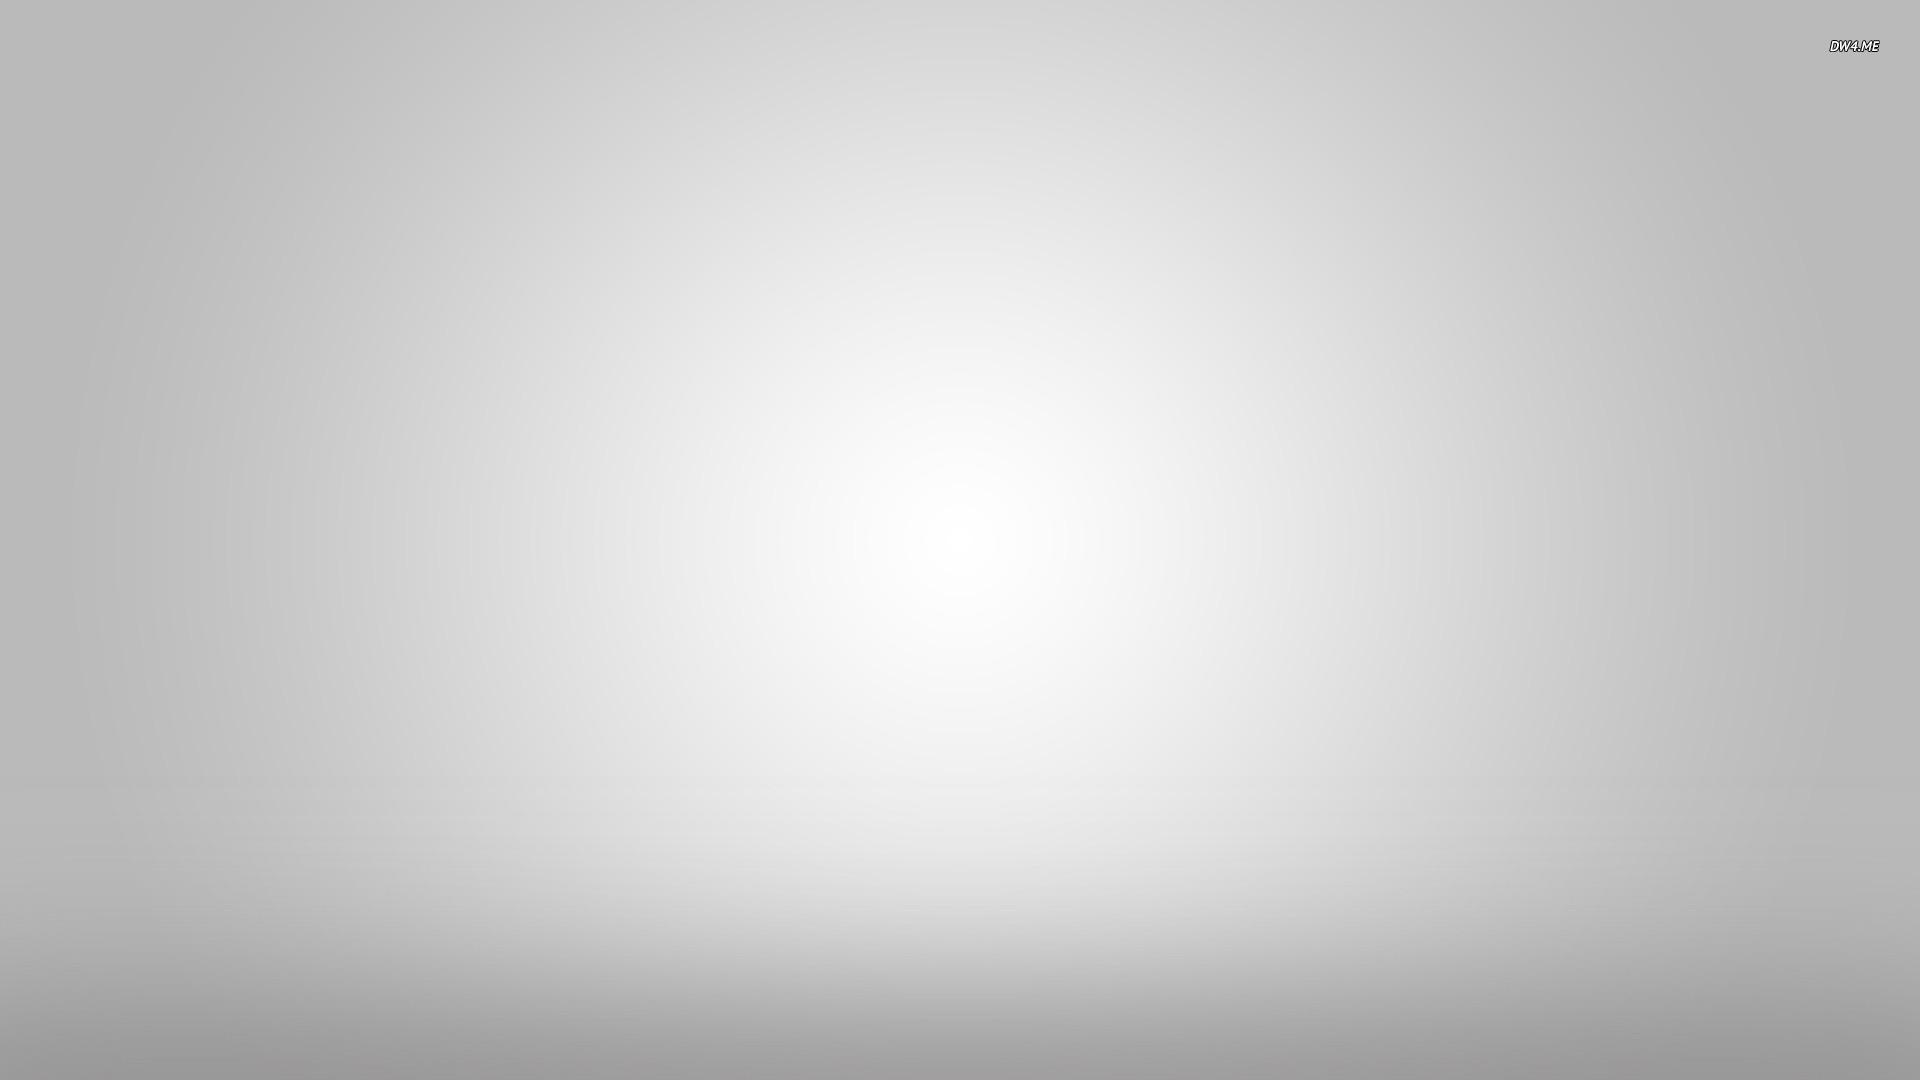 26 units of Gray Wallpaper